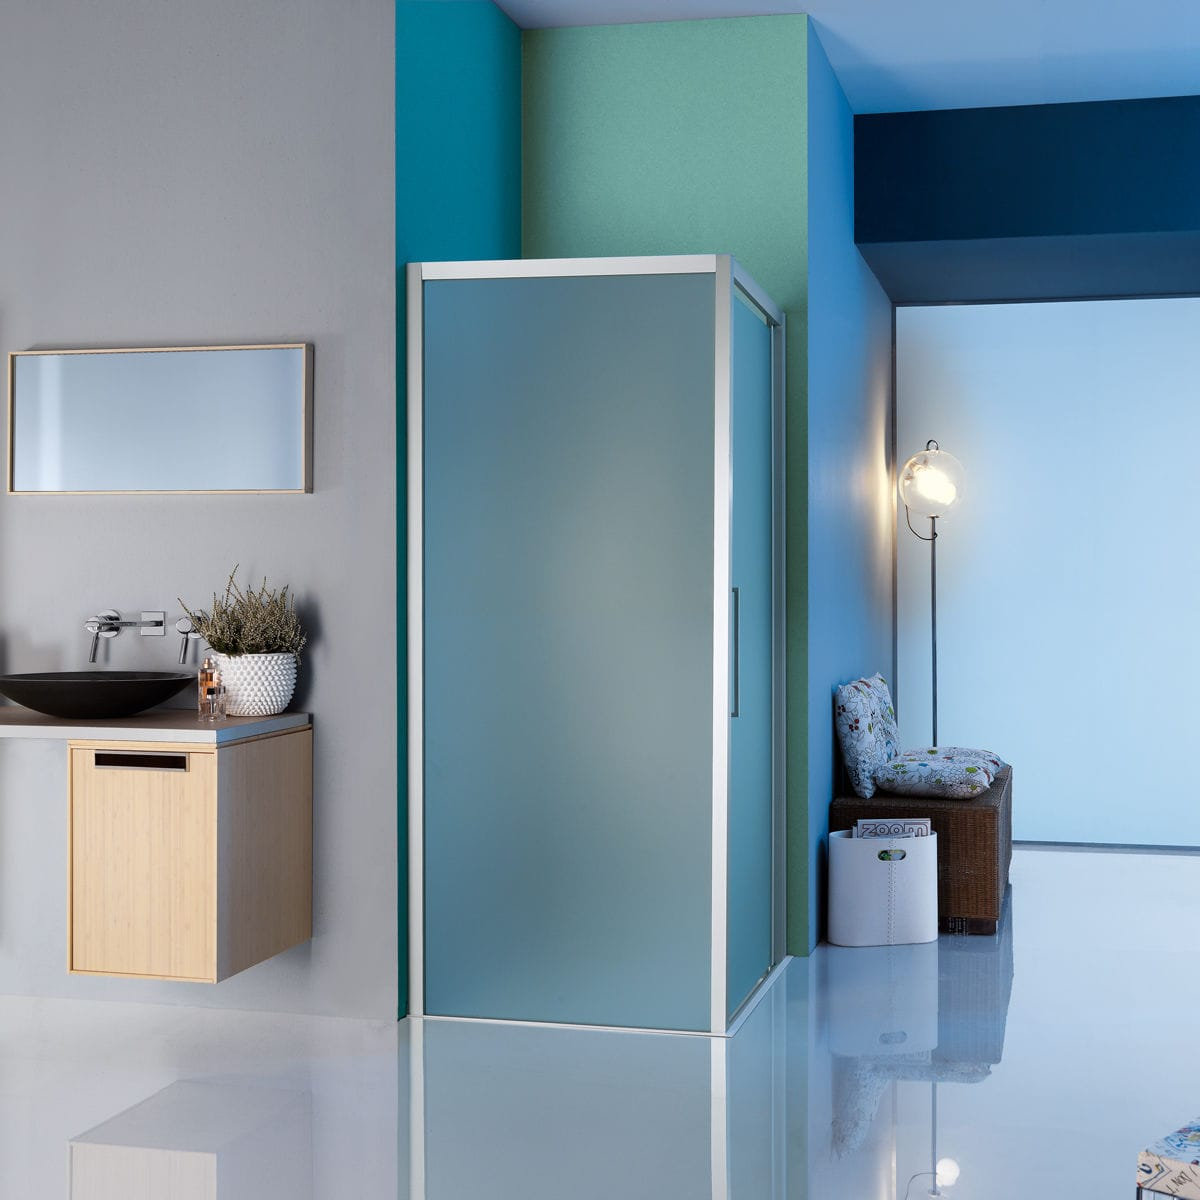 Swing shower screen / corner / glass - EUROPA SP: B7924 - SAMO